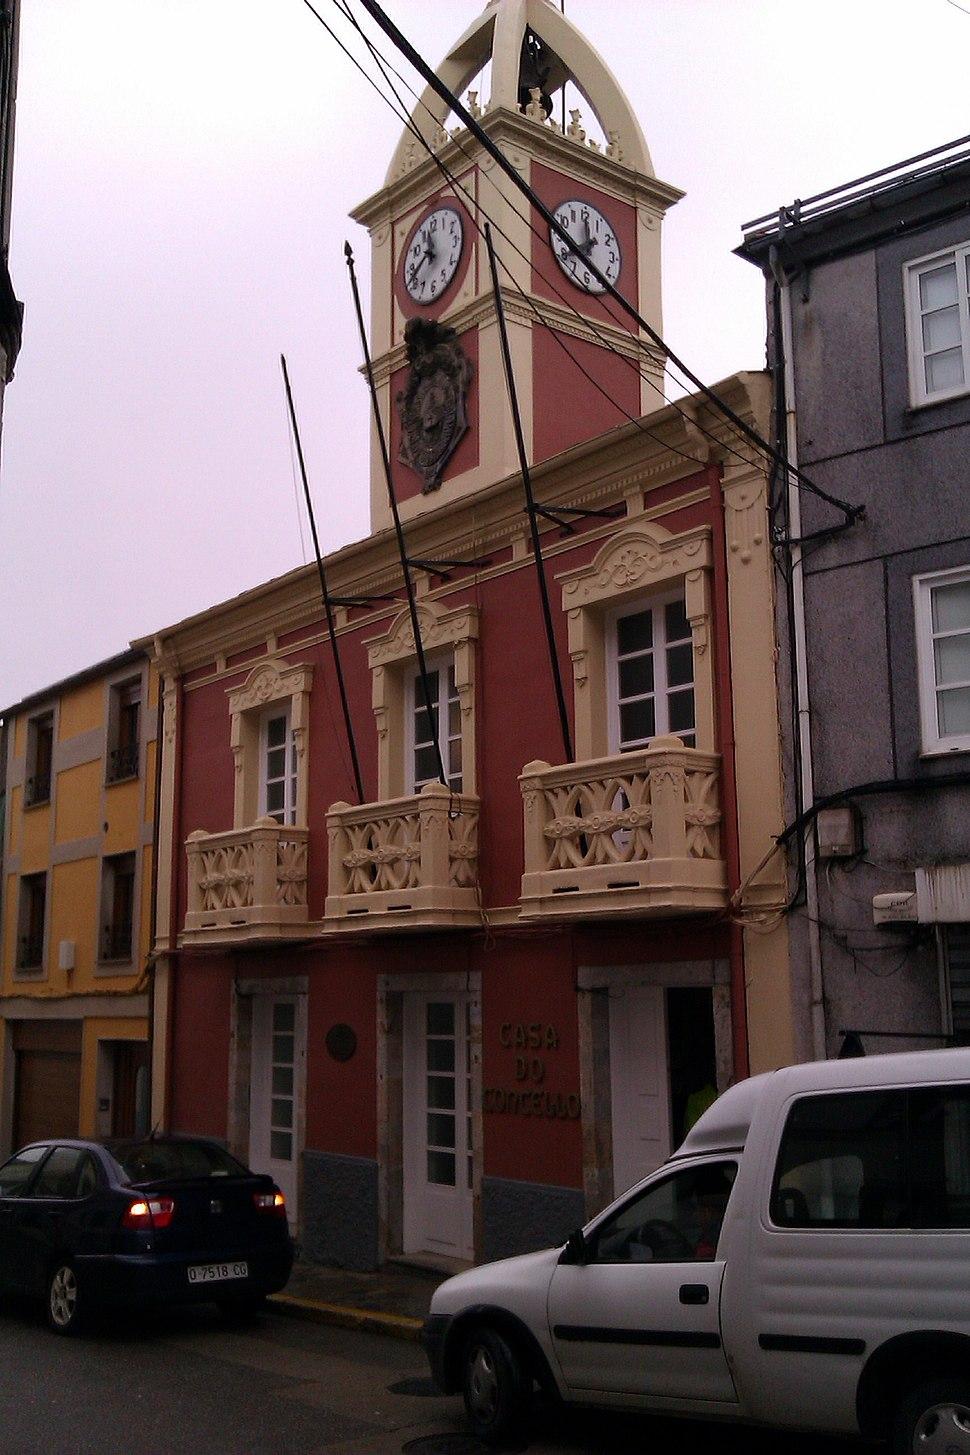 Casa do Concello da Fonsagrada, Lugo